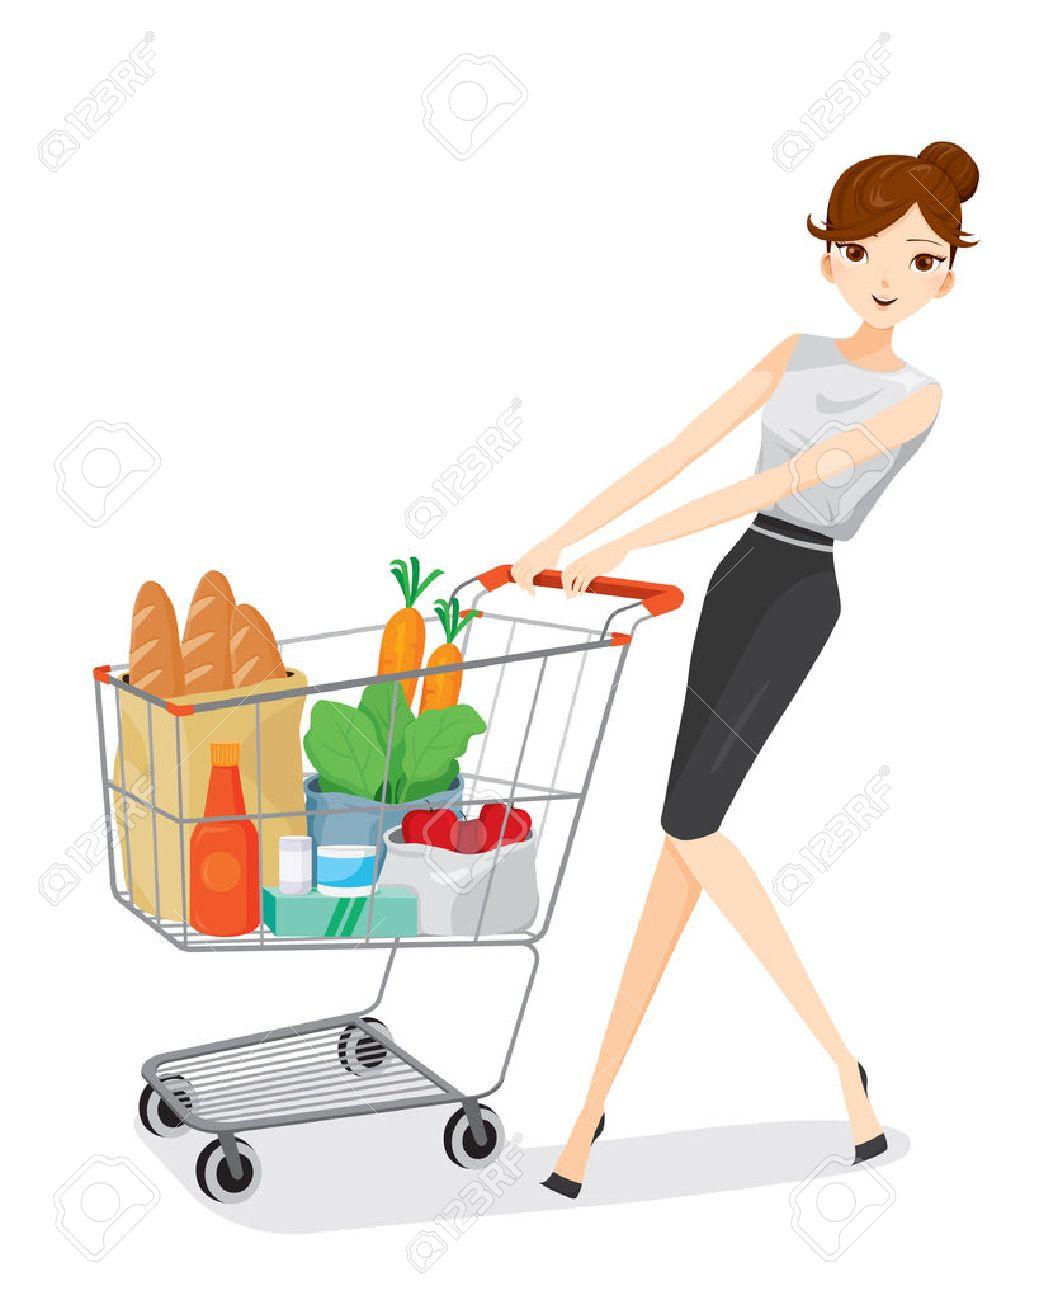 Woman pushing shopping cart, goods, food, beverage, beauty, lifestyle - 53424261